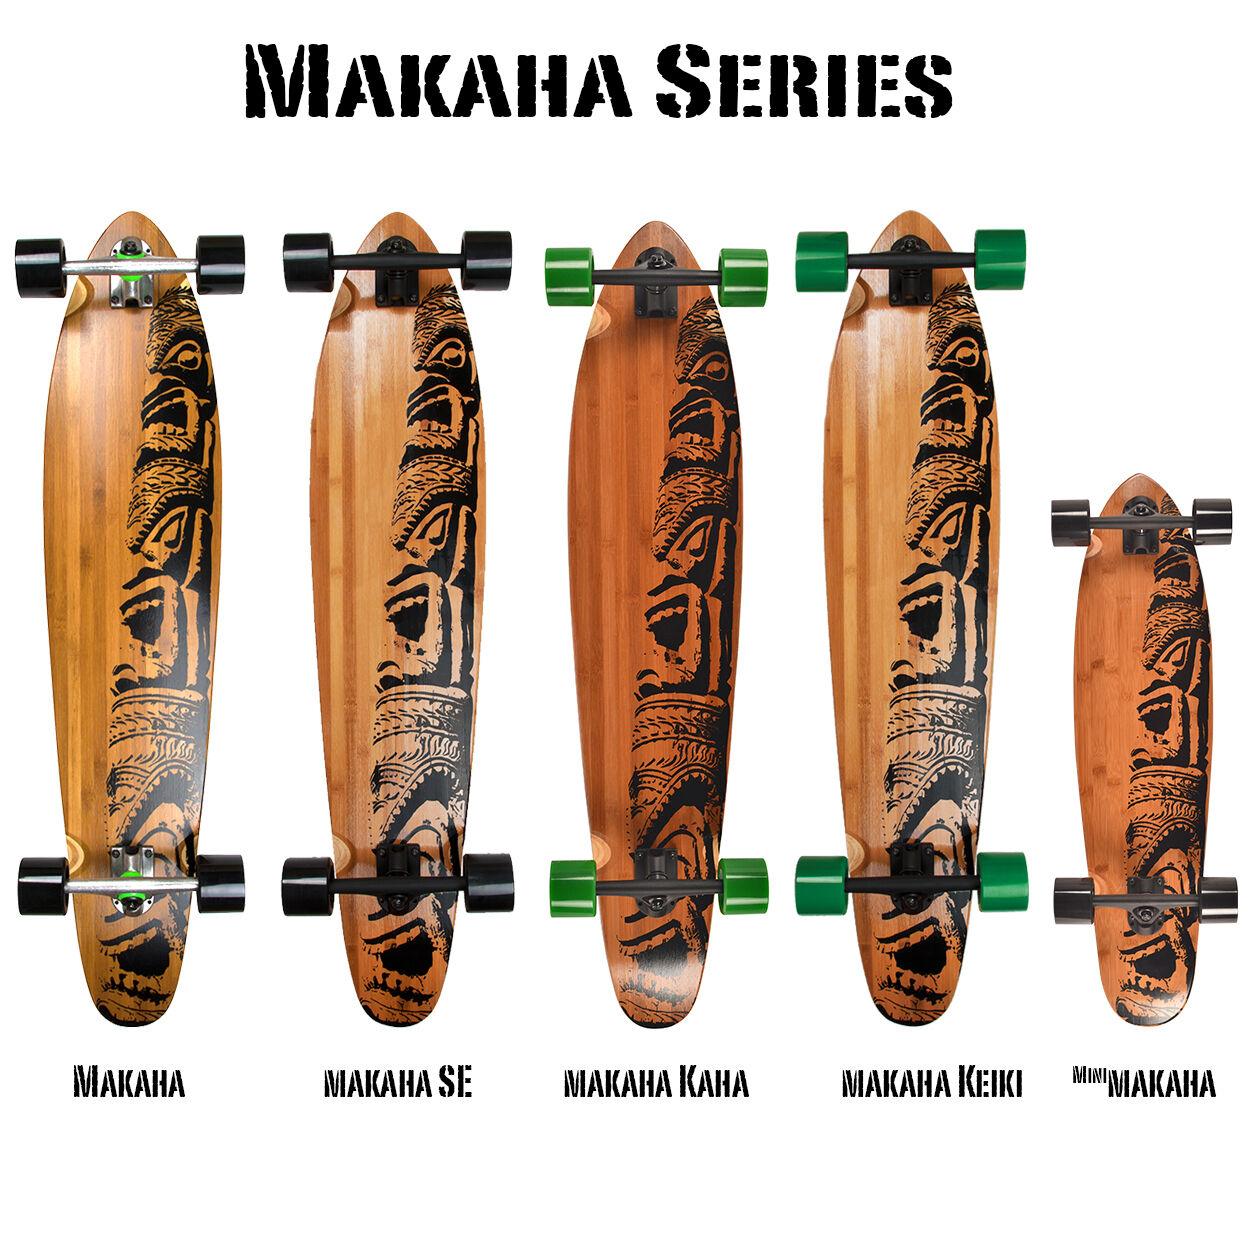 Jucker Hawaii longboard Makaha - 5 diferentes variantes al peso adecuado